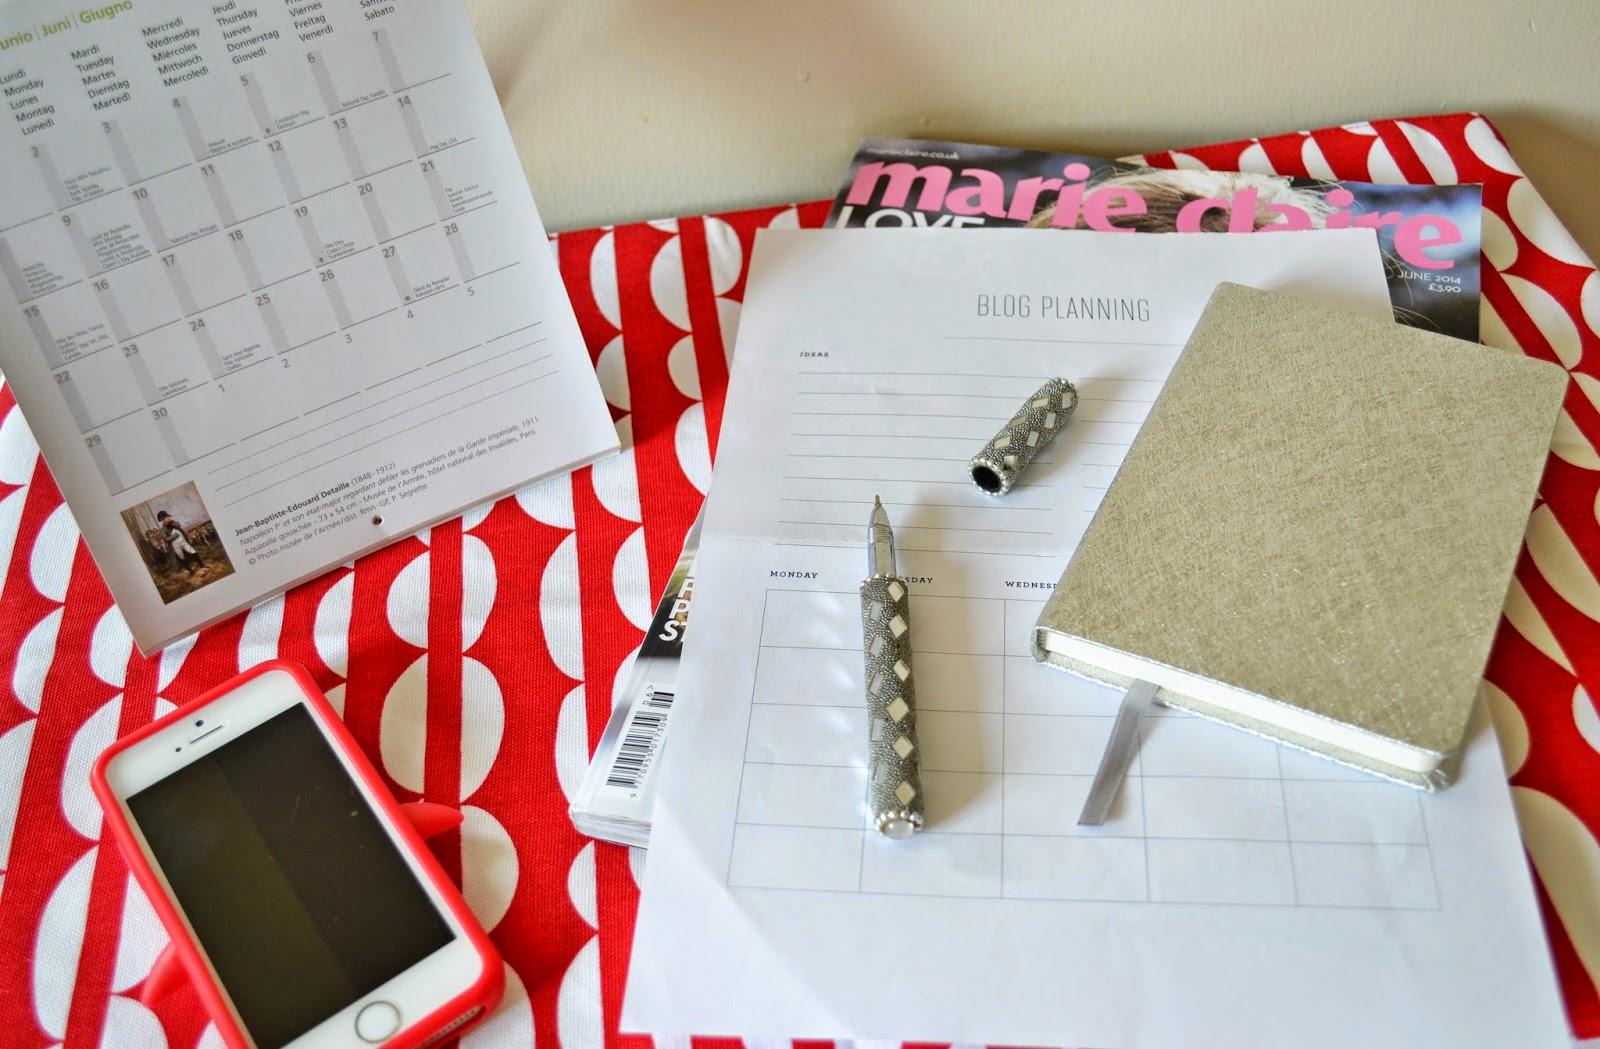 Tips for New Bloggers with Blog Calendar - Aspiring Londoner